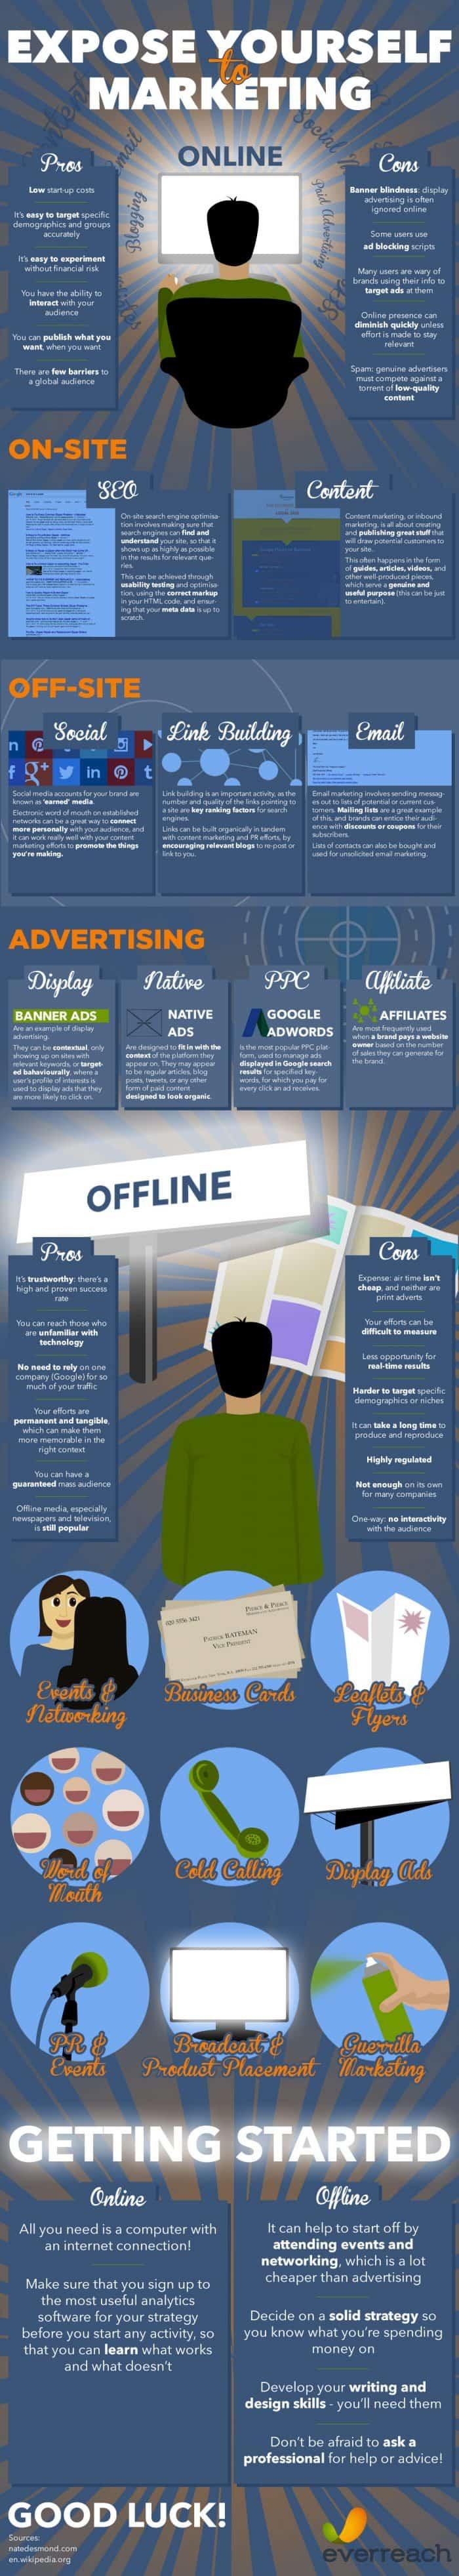 Marketing Infographic